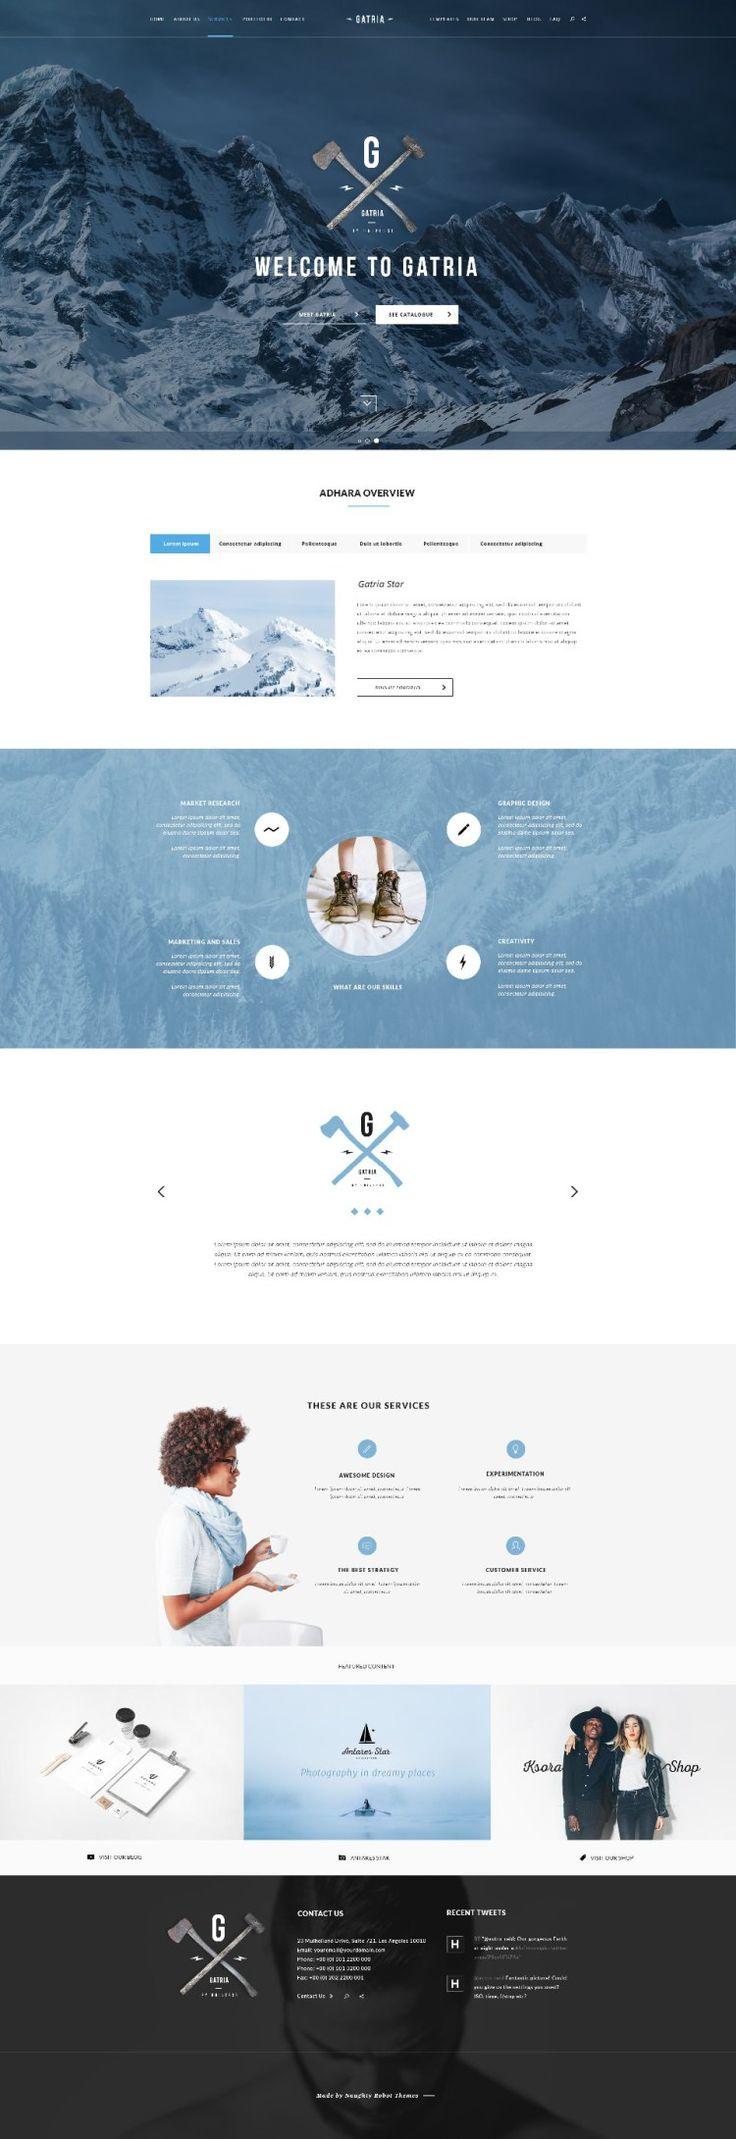 Hydrus Web Design Inspiration by naughtyrobot part 2